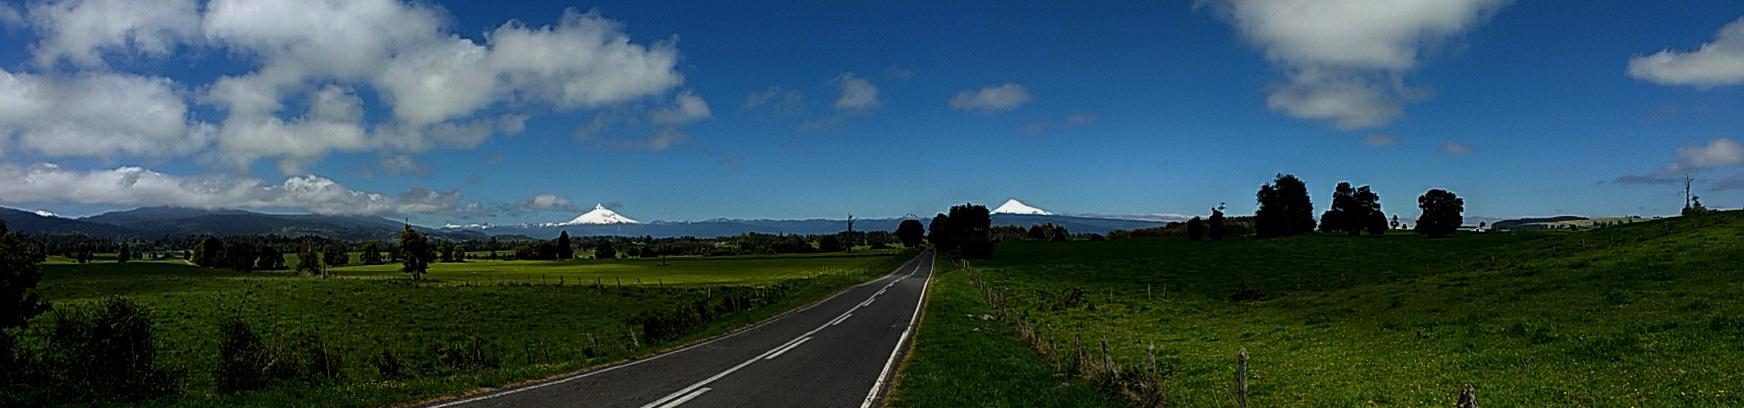 Volcan Osorno Chile Patagonia